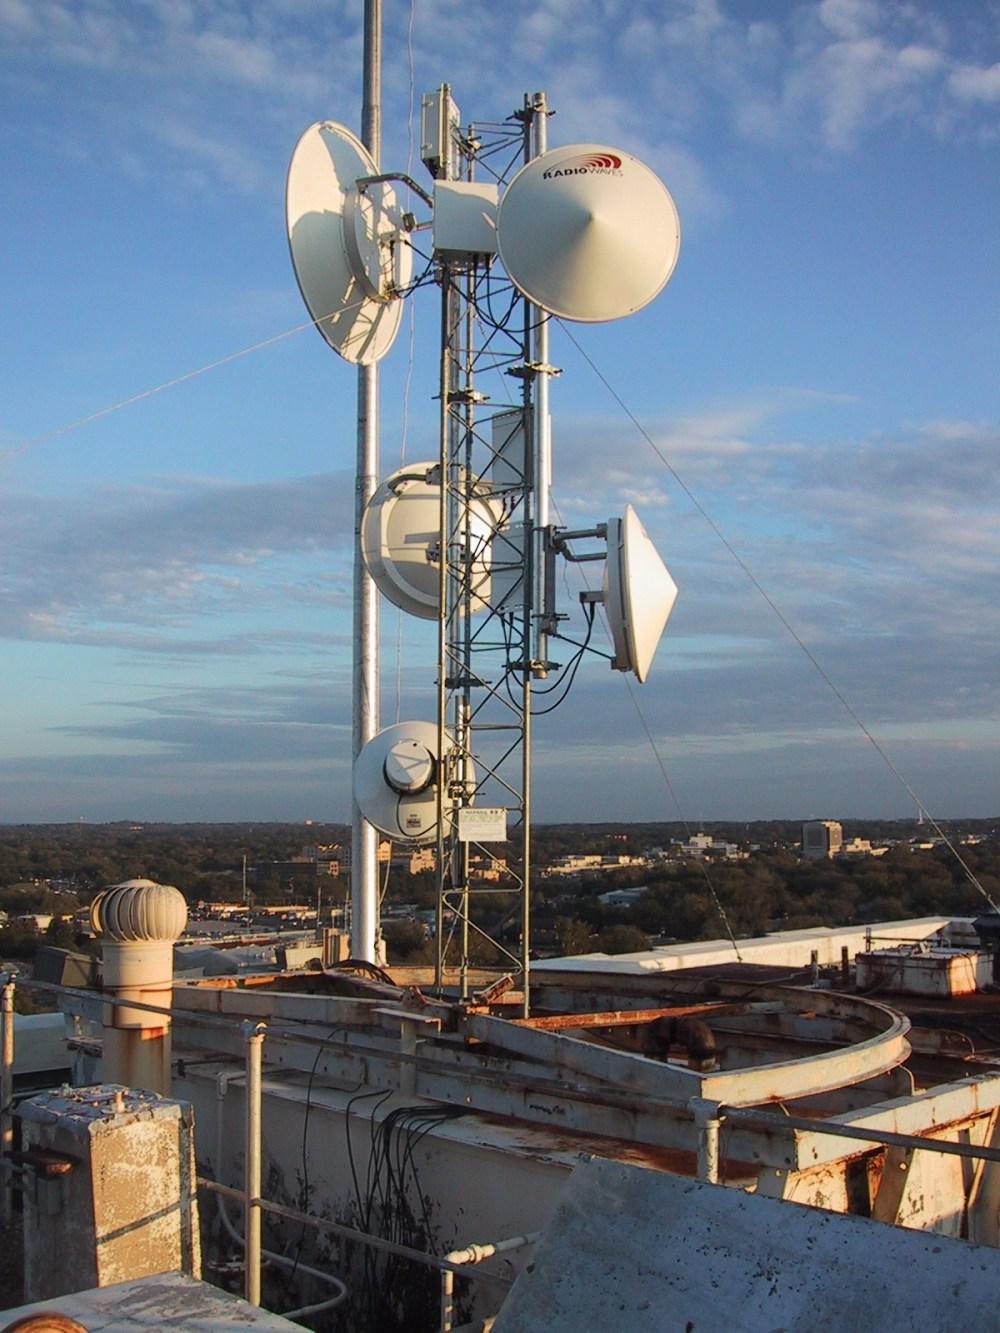 medium resolution of wireless internet service provider